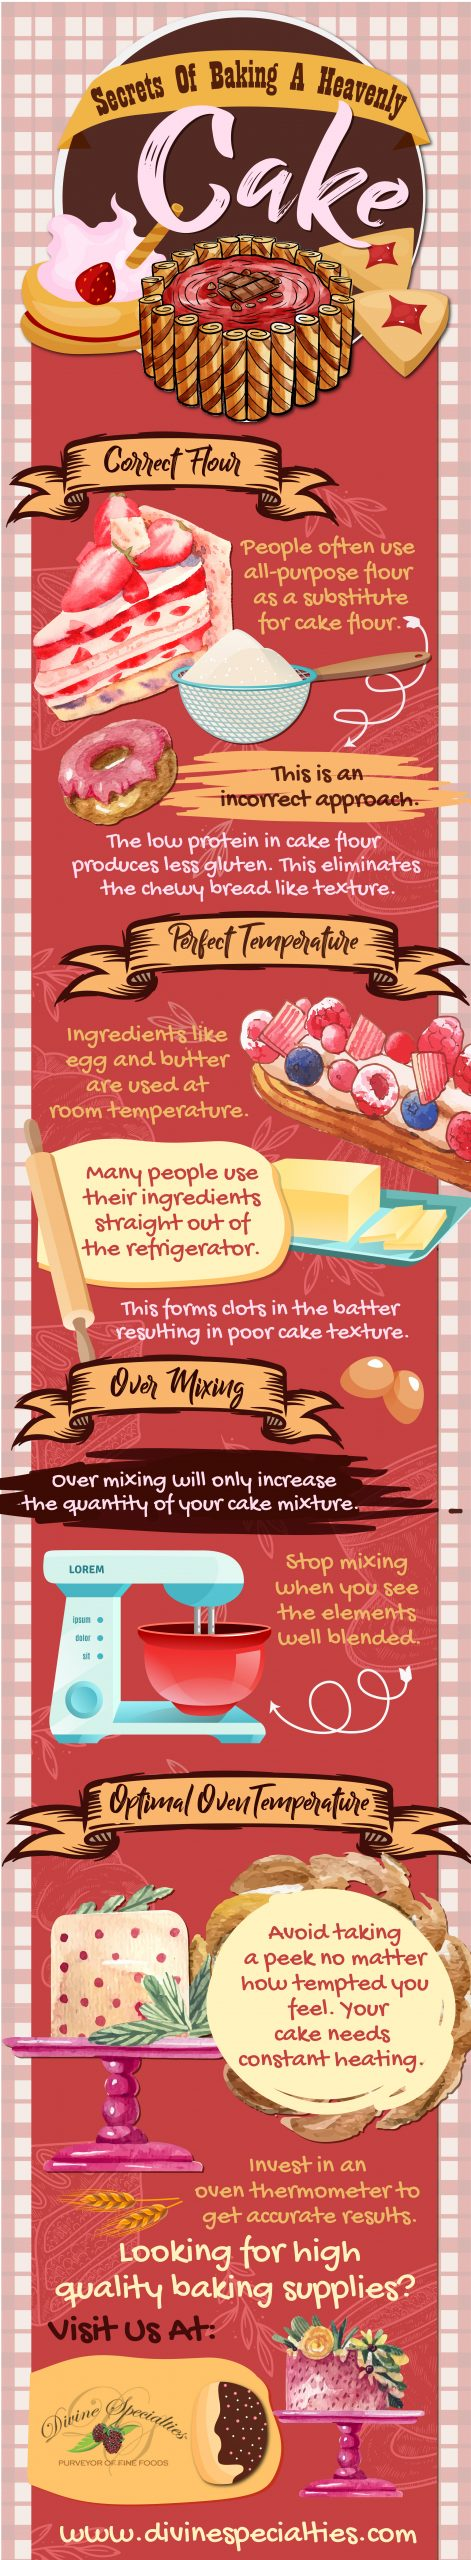 Secrets of Baking a Heavenly Cake